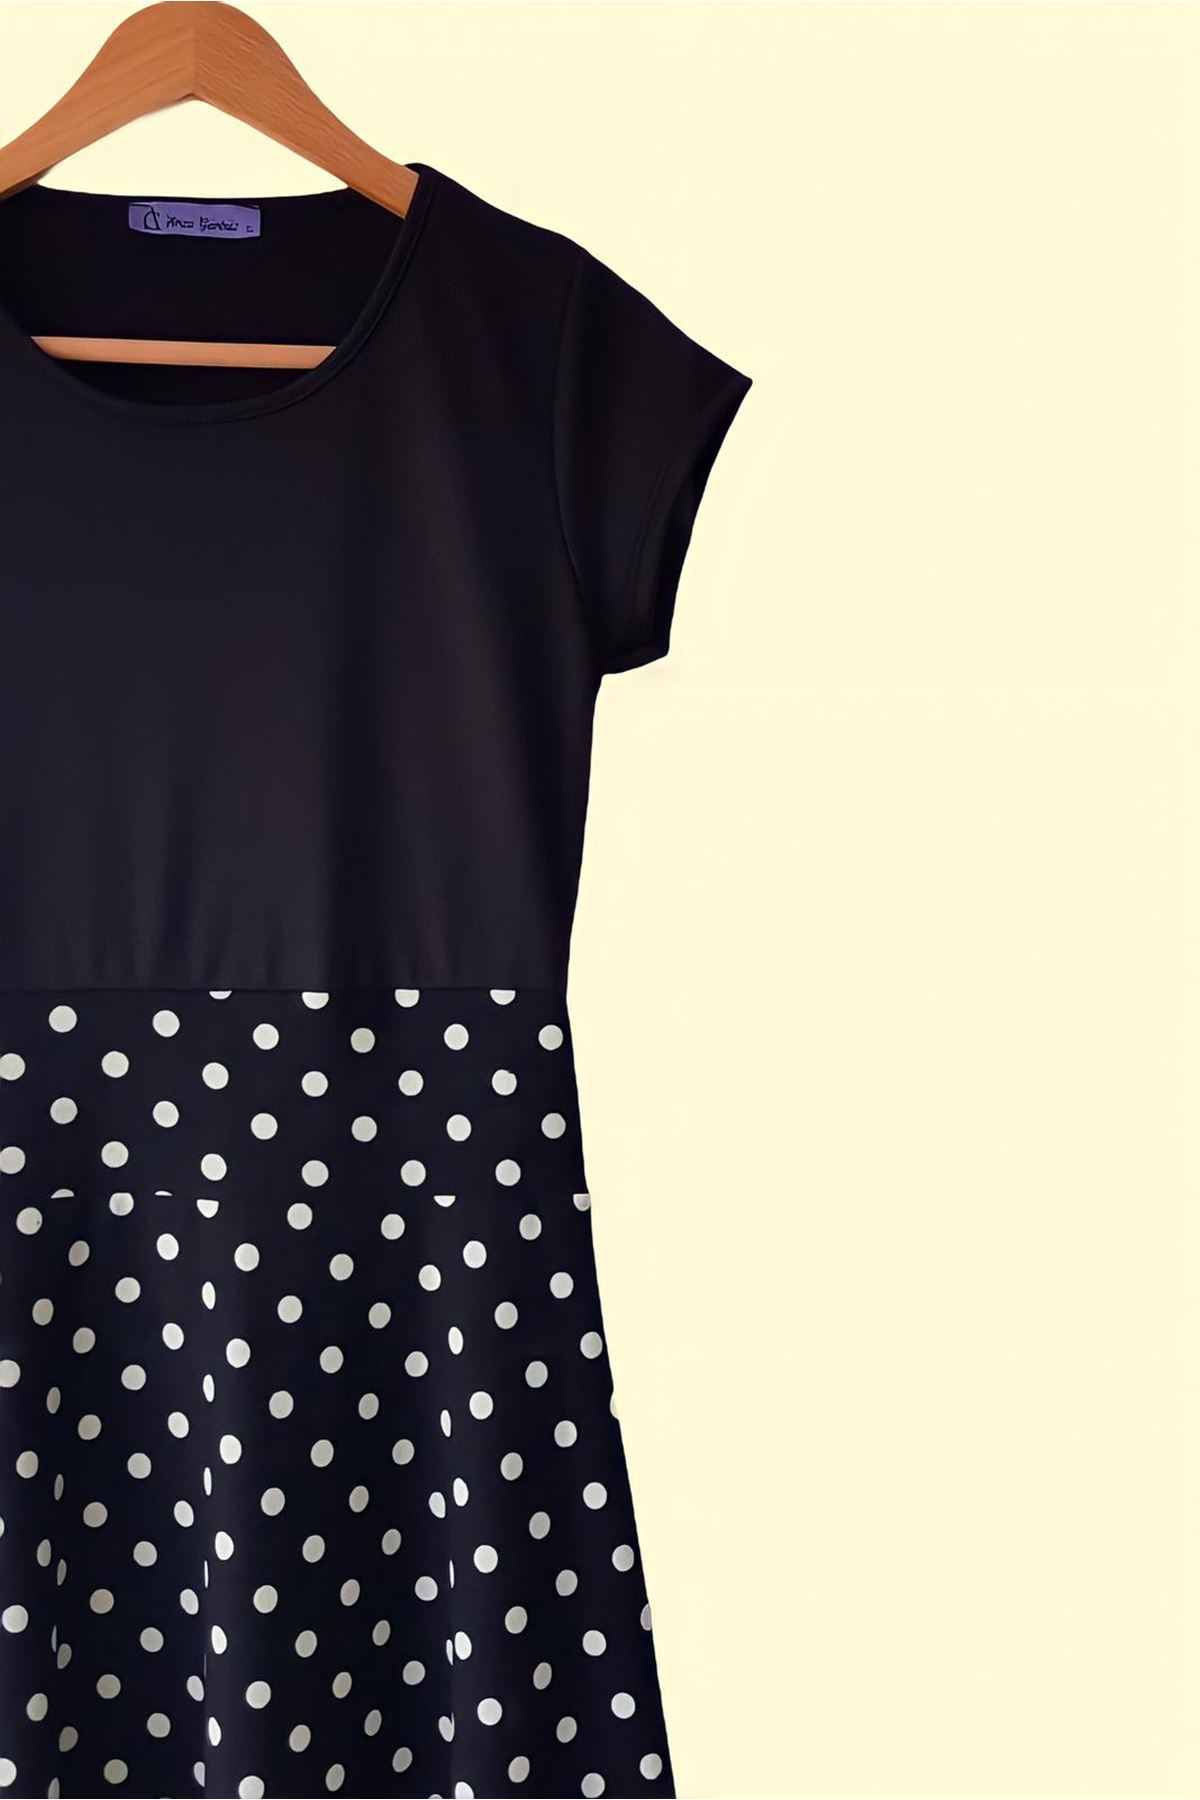 Puan Desen Maxi Elbise - siyah